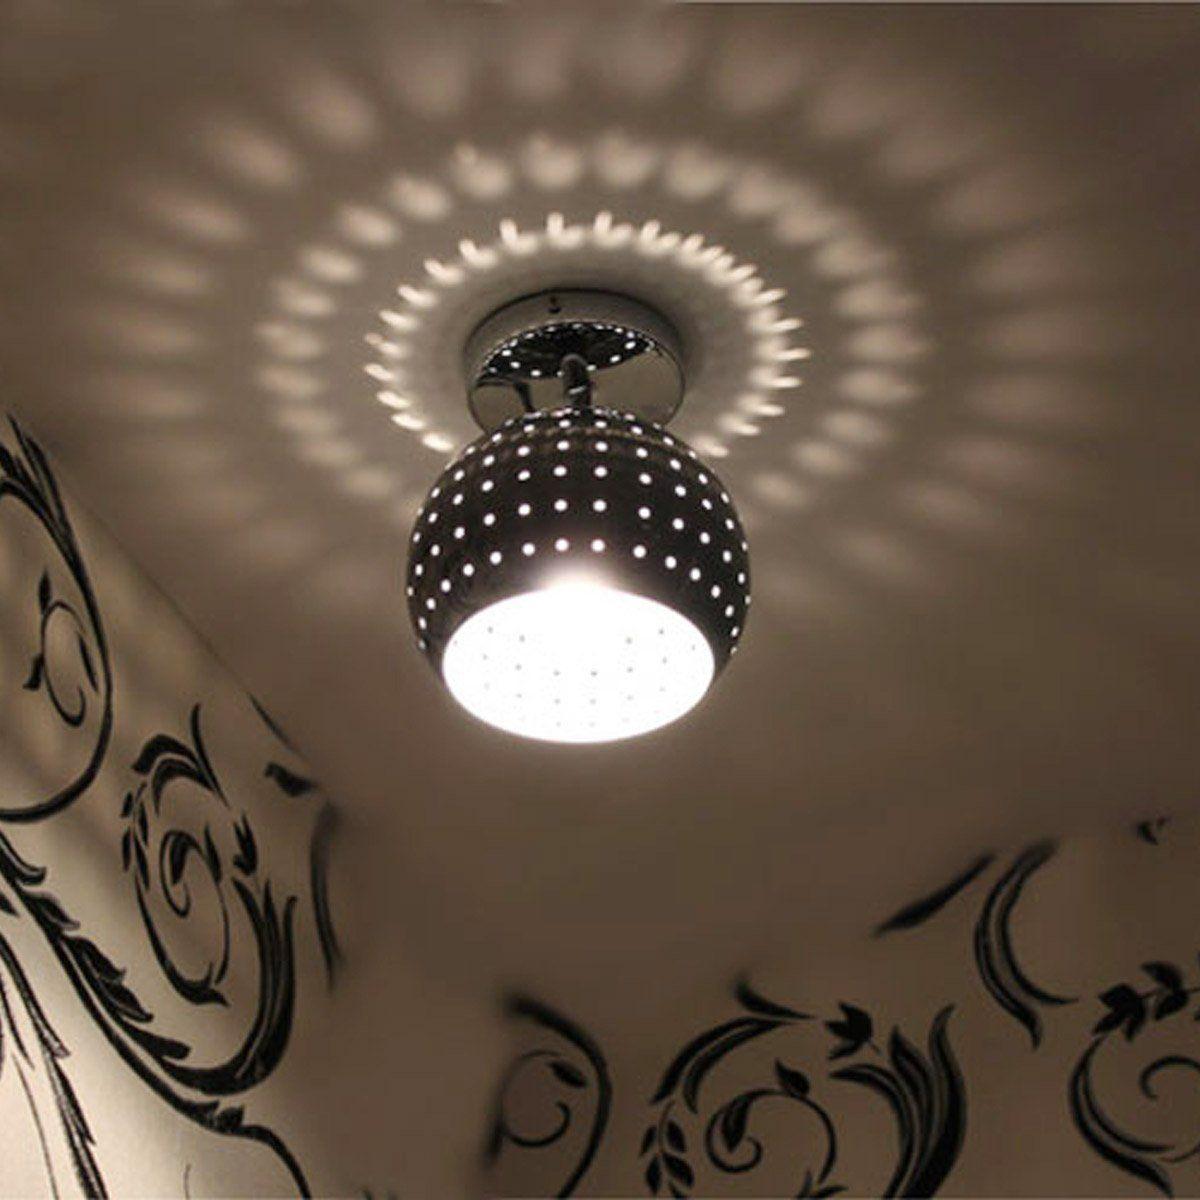 3w Modern Led Ceiling Light With Scattering Globe Light Design Shadow Effect Ceiling Light Fixture Flush Mount Unique Pendant Lighting Decorative